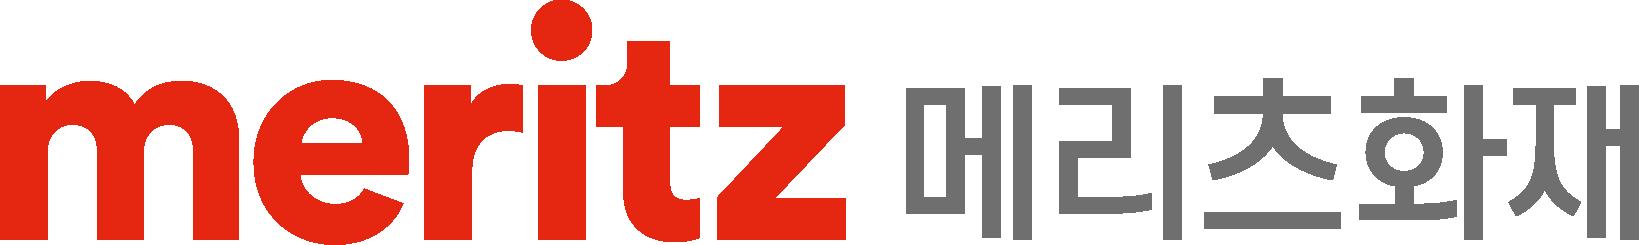 Meritz-Fire-Banner-Ads